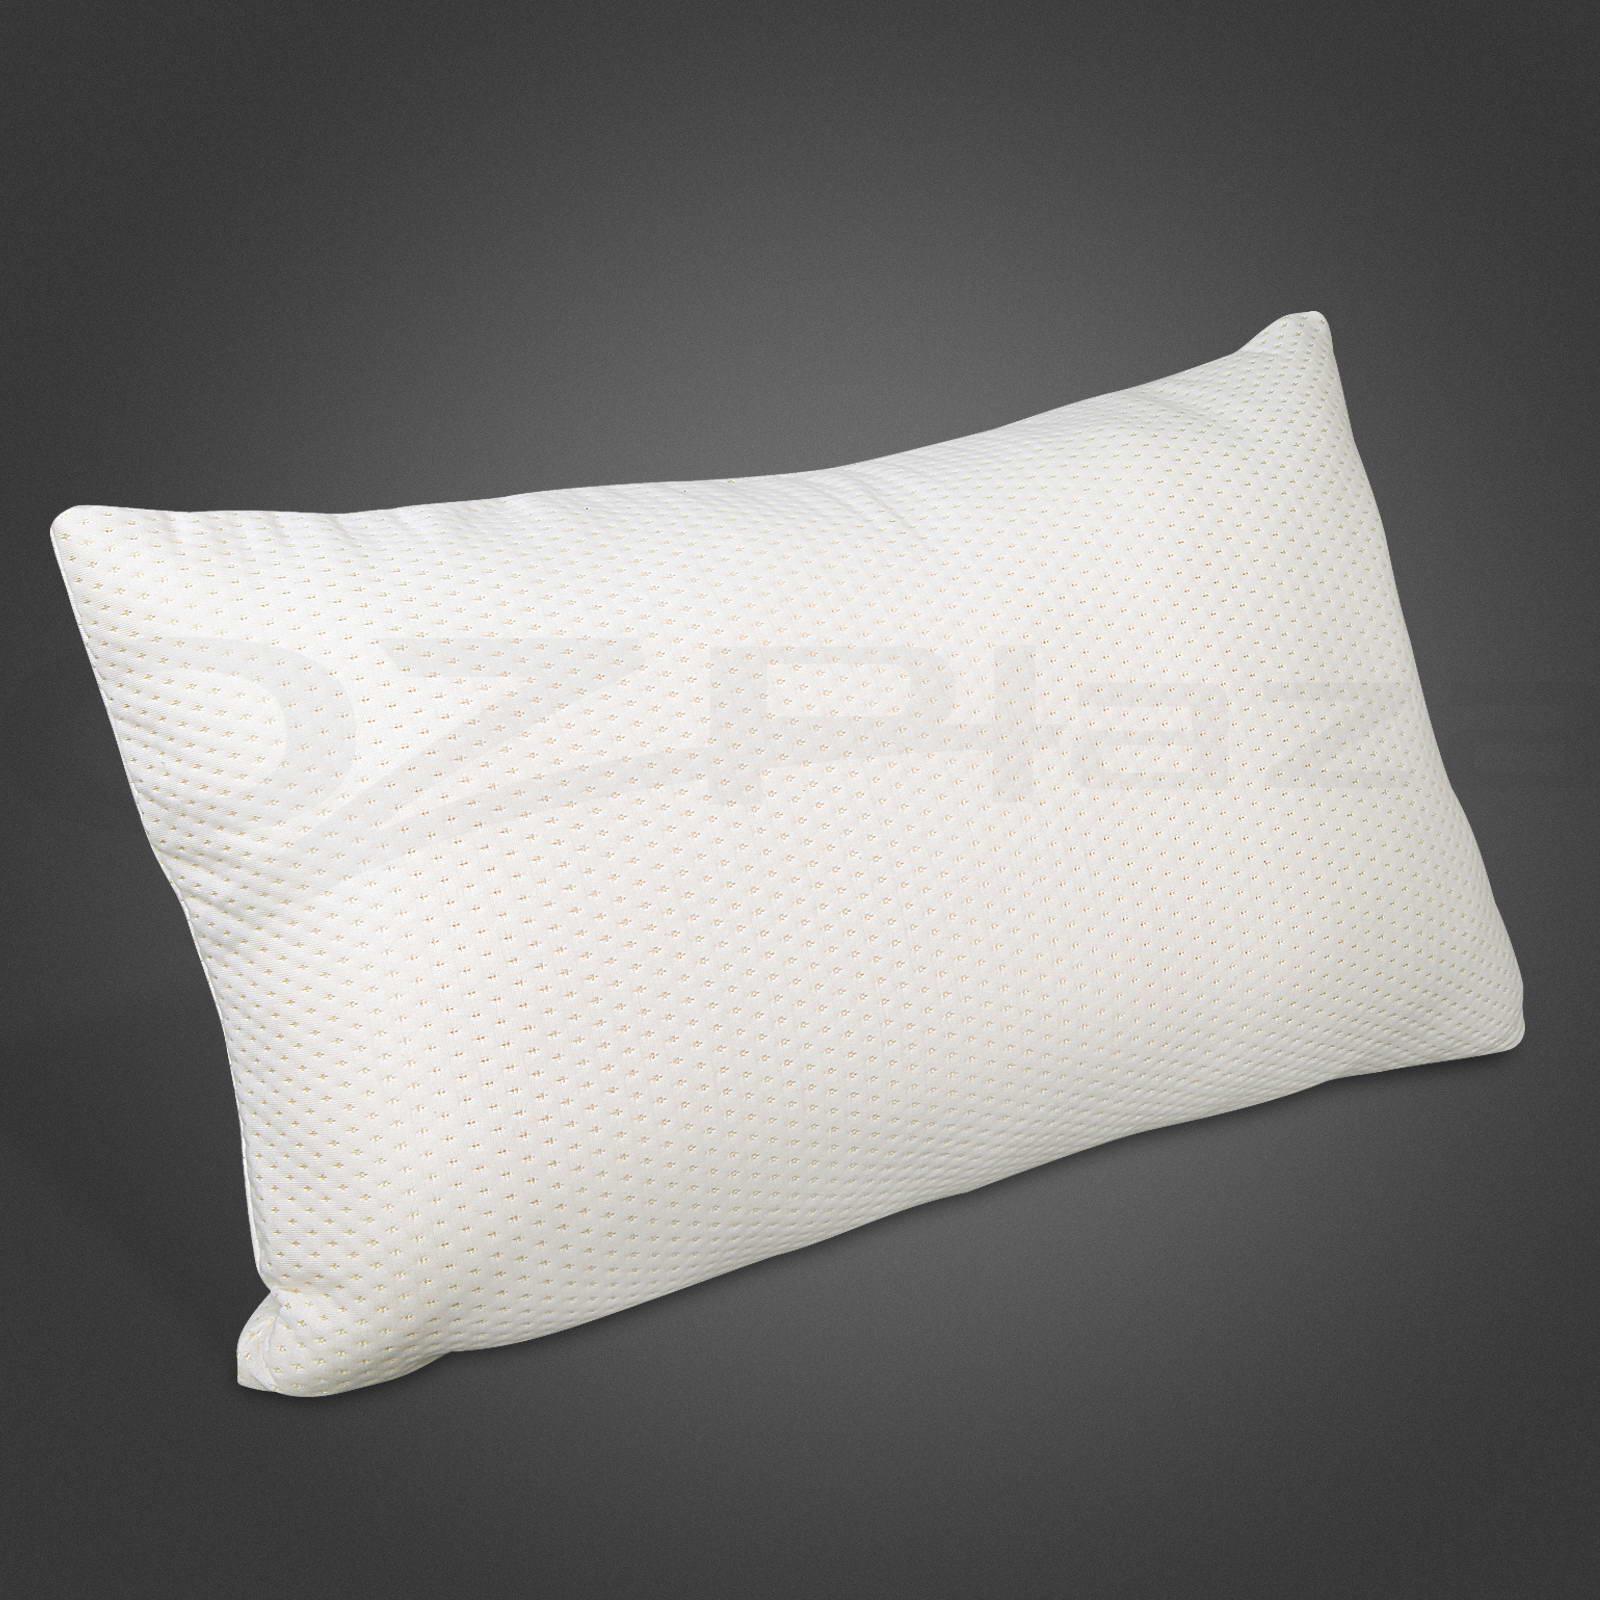 2 X Premium Visco Elastic Home Bed Memory Foam Pillow Extra Thick Medium To High Ebay